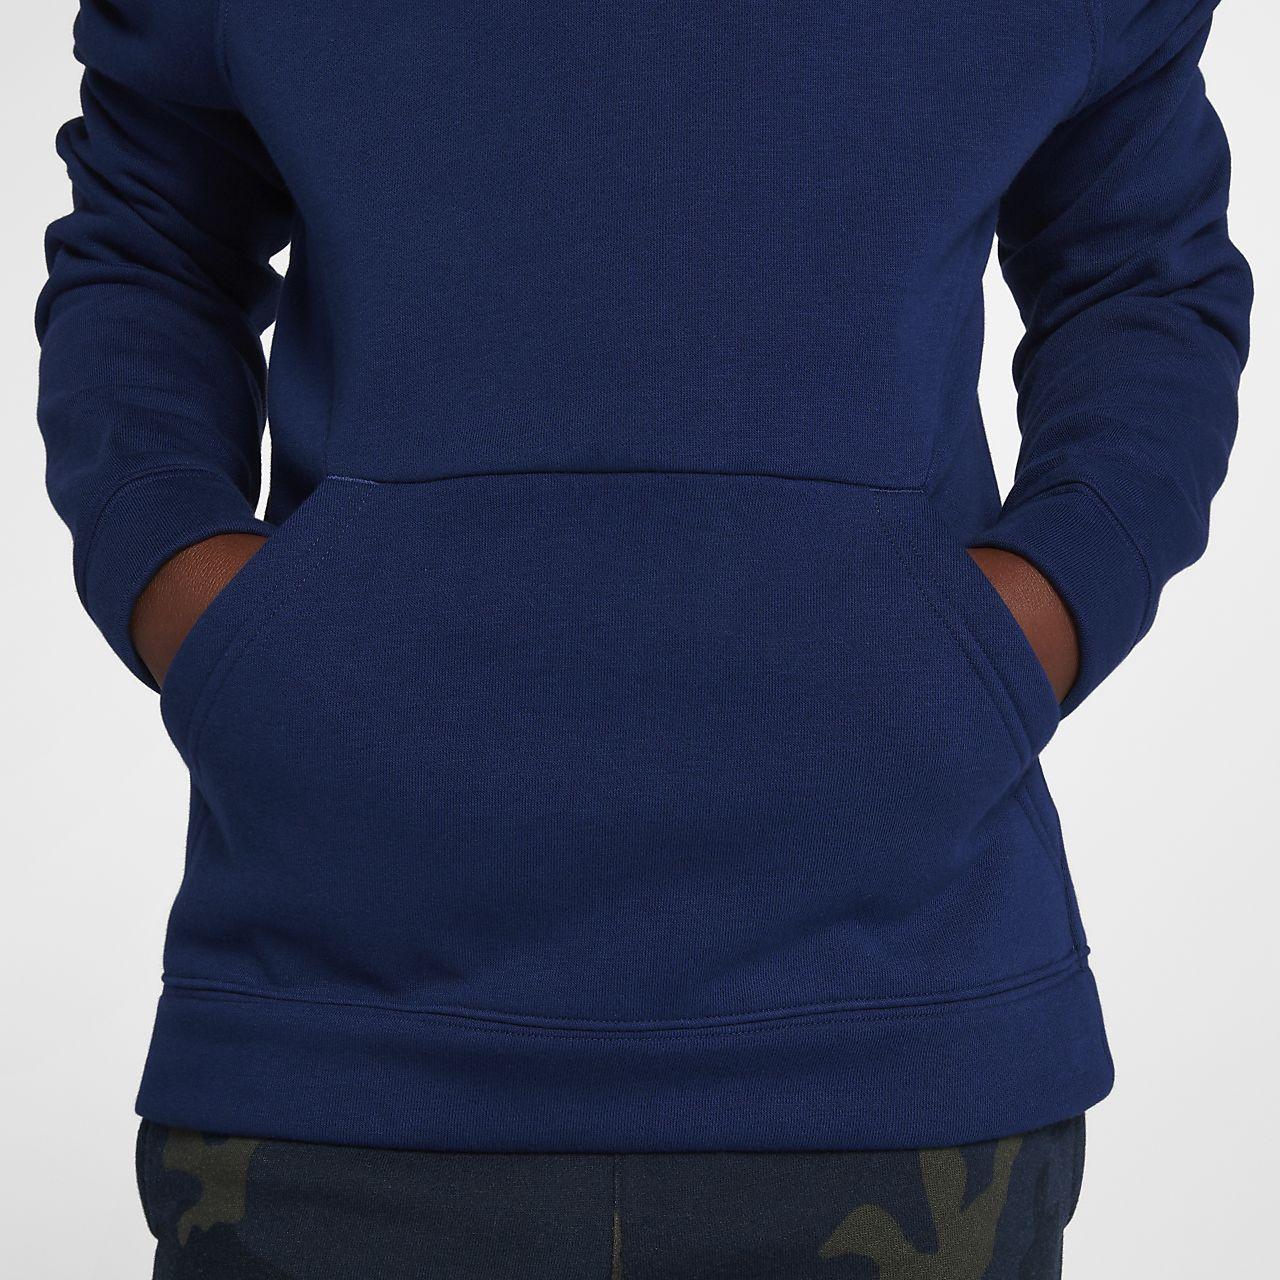 732727d3b Nike Womens Sweatshirt Kohls – EDGE Engineering and Consulting Limited